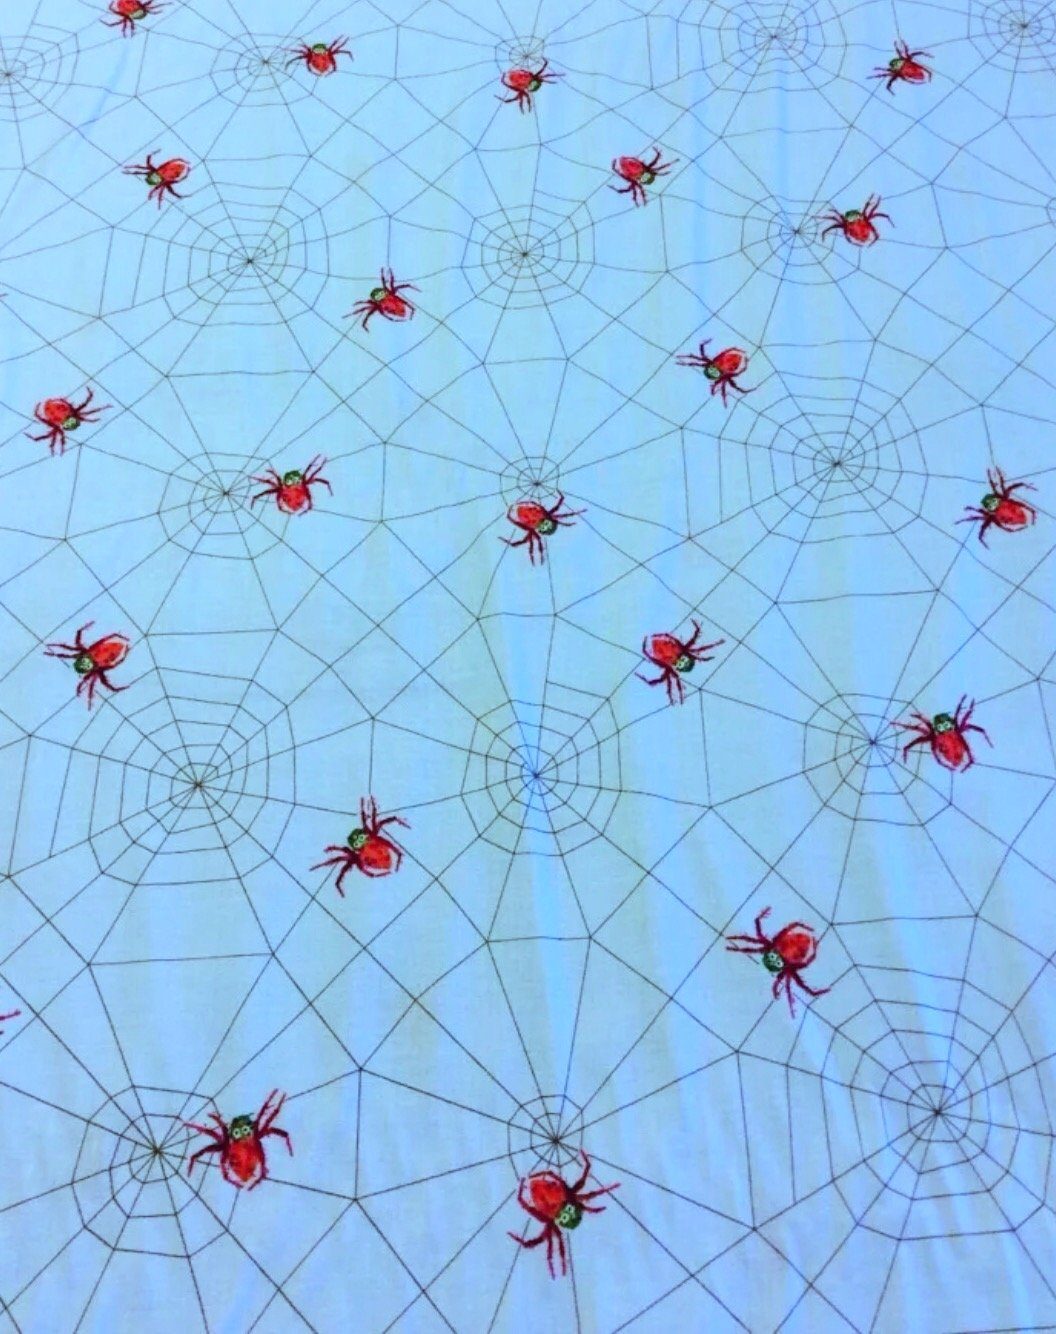 Fat Quarter! Eric Carle Spider Web Children's Book Retro Quilt Fabric Cotton Fabric Hungry Caterpillar FQFF26